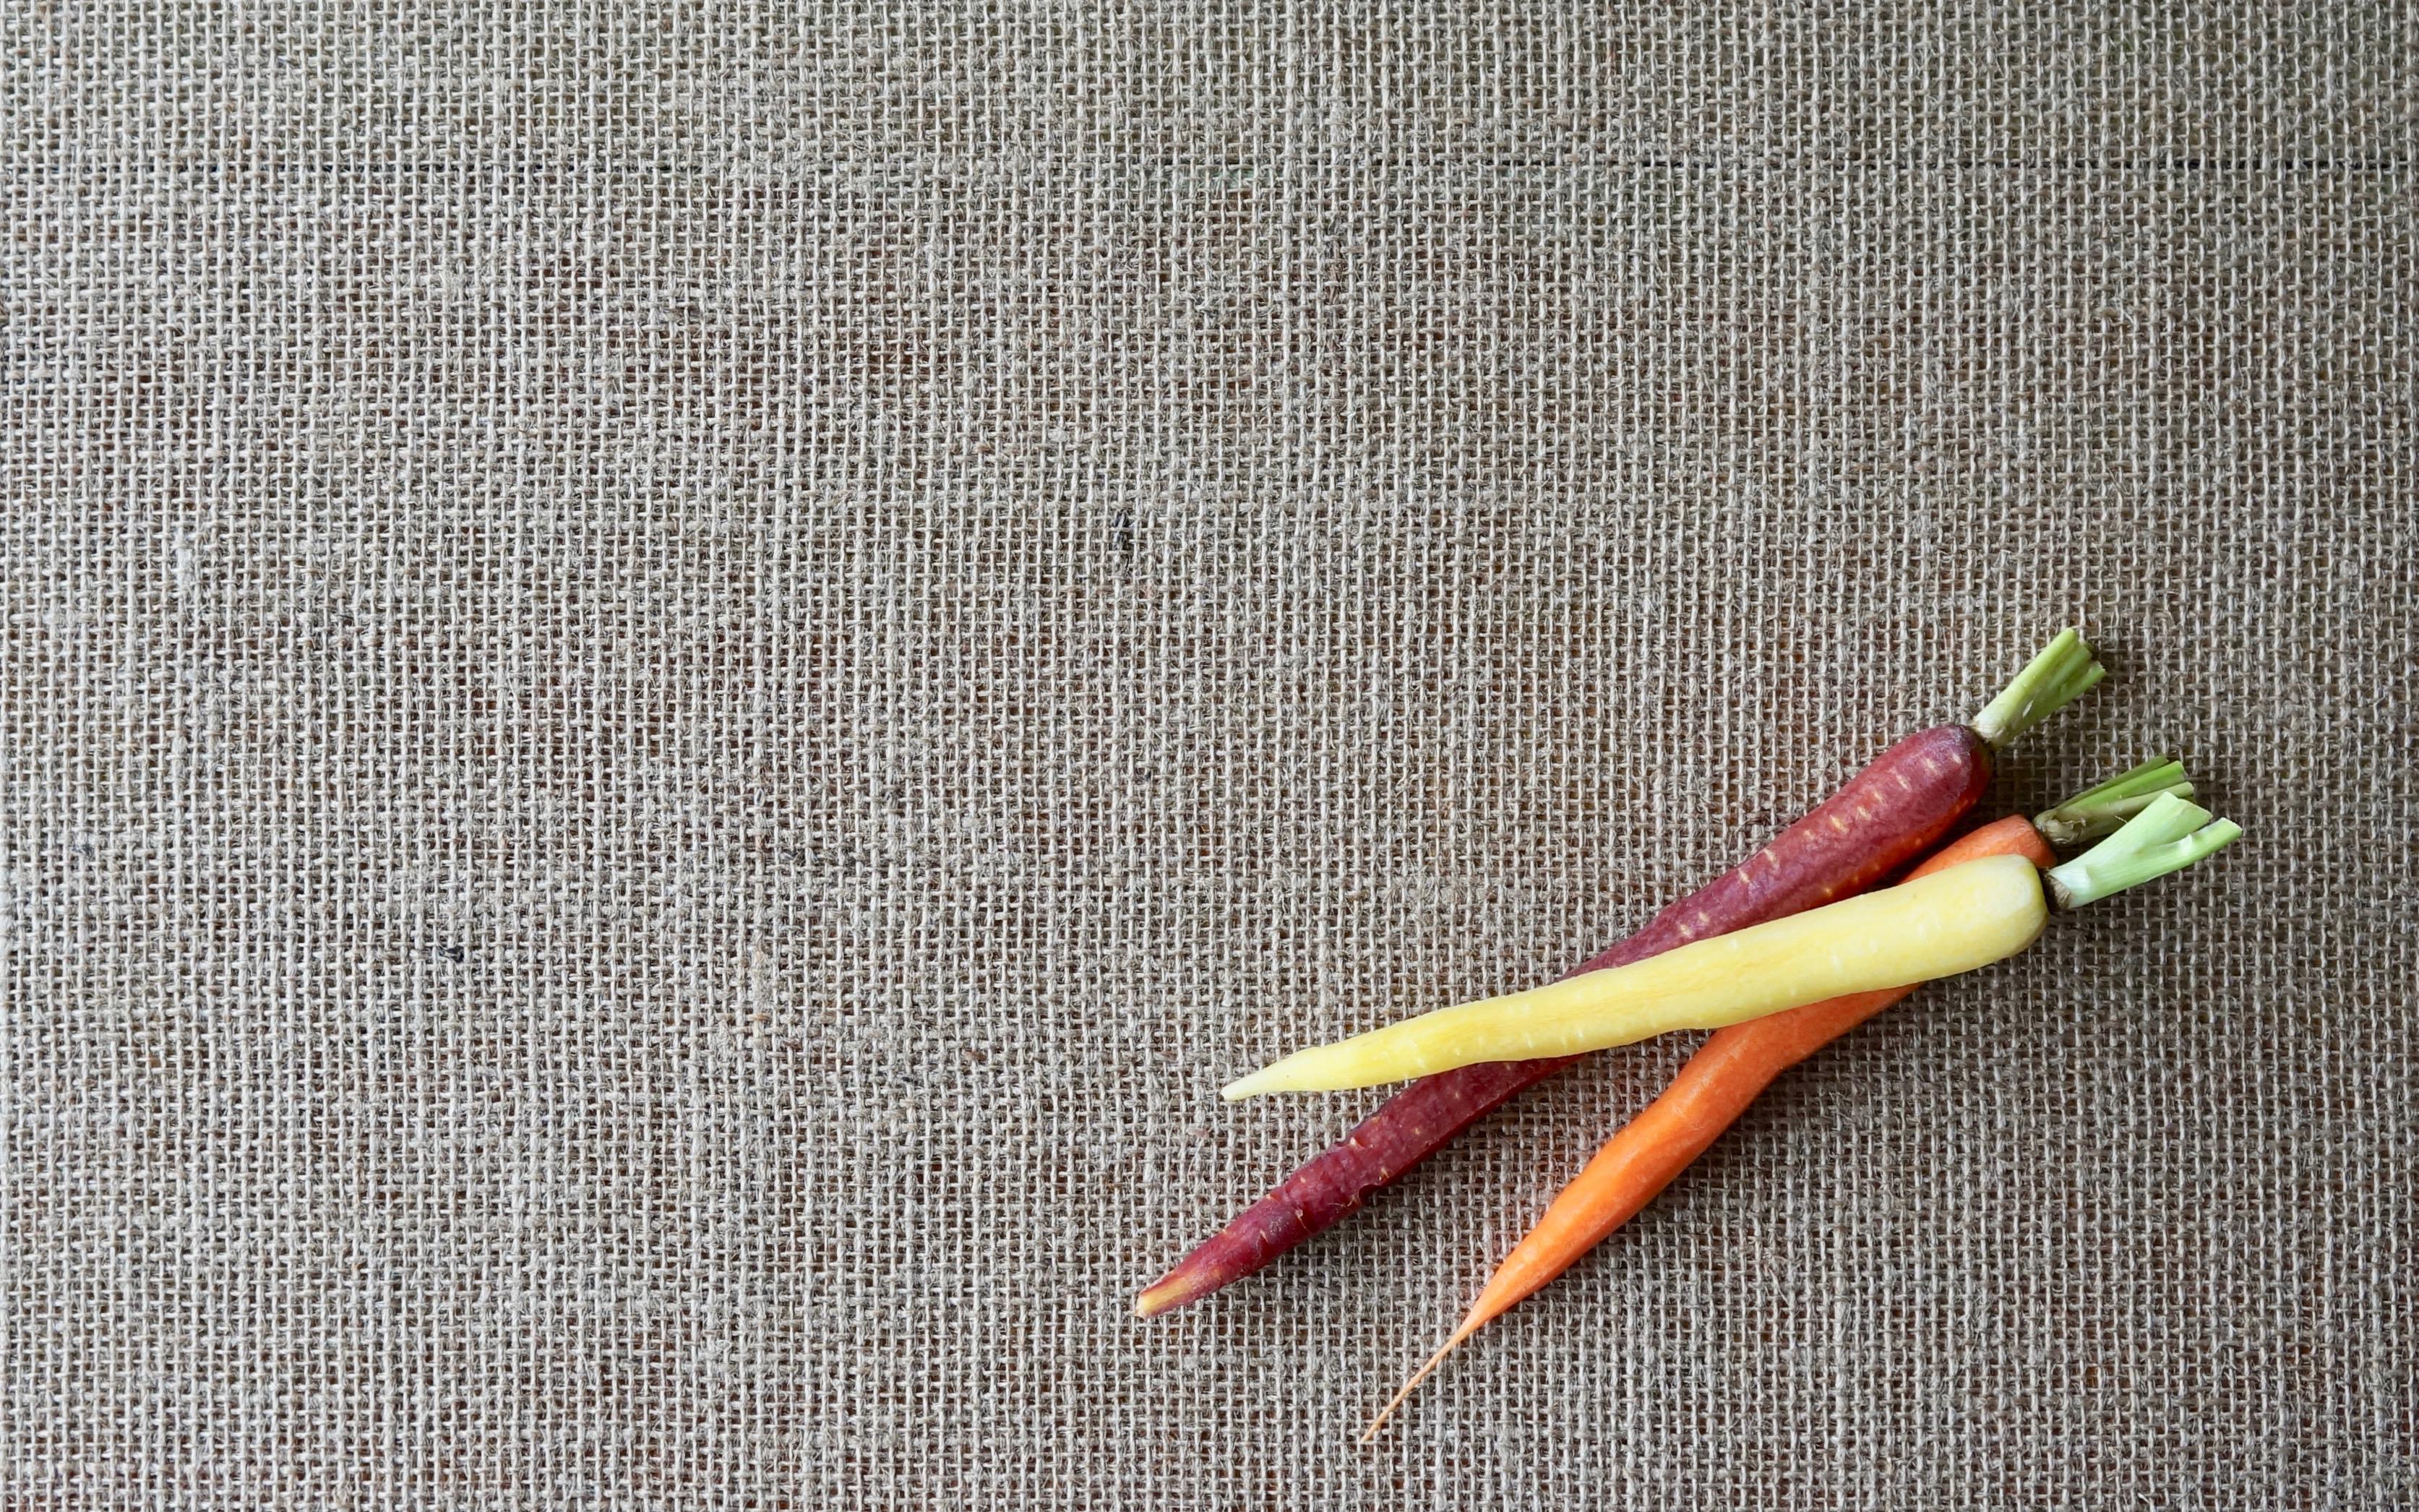 Parsley-Butter-Rainbow-Carrots-Rebecca-Gordon-Editor-In-Chief-Buttermilk-Lipstick-Culinary-Entertaining-Techniques-RebeccaGordon-Pastry-Chef-Birmingham-Alabama